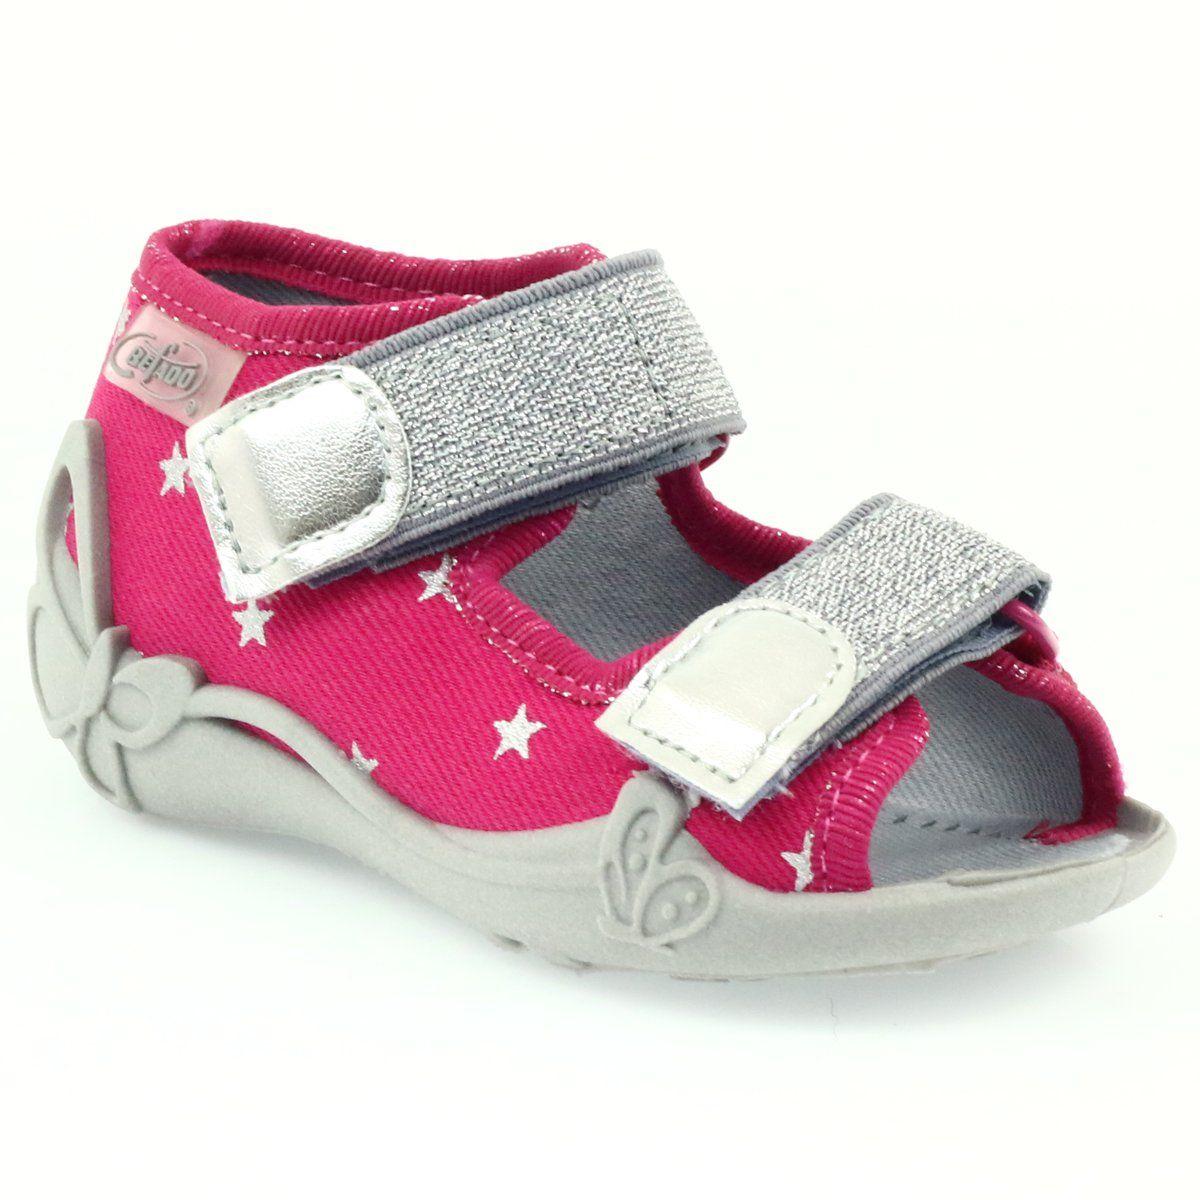 Befado Buty Dzieciece Sandalki Kapcie 242p085 Szare Rozowe Childrens Shoes Childrens Slippers Kid Shoes